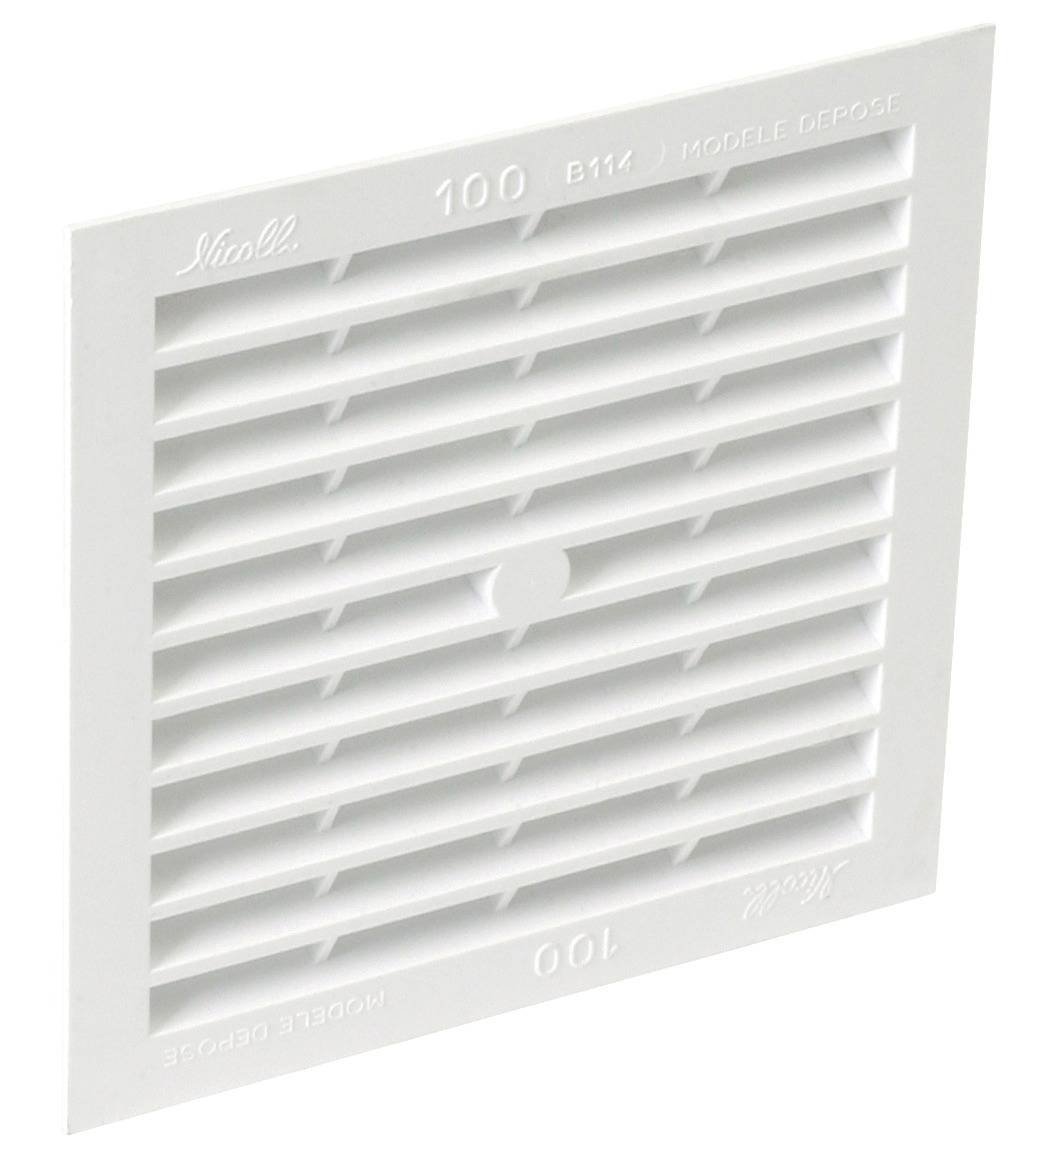 NICOLL Grille de ventilation en applique Type 100cm2 carrée 130x130 mm - NICOLL - 1B114